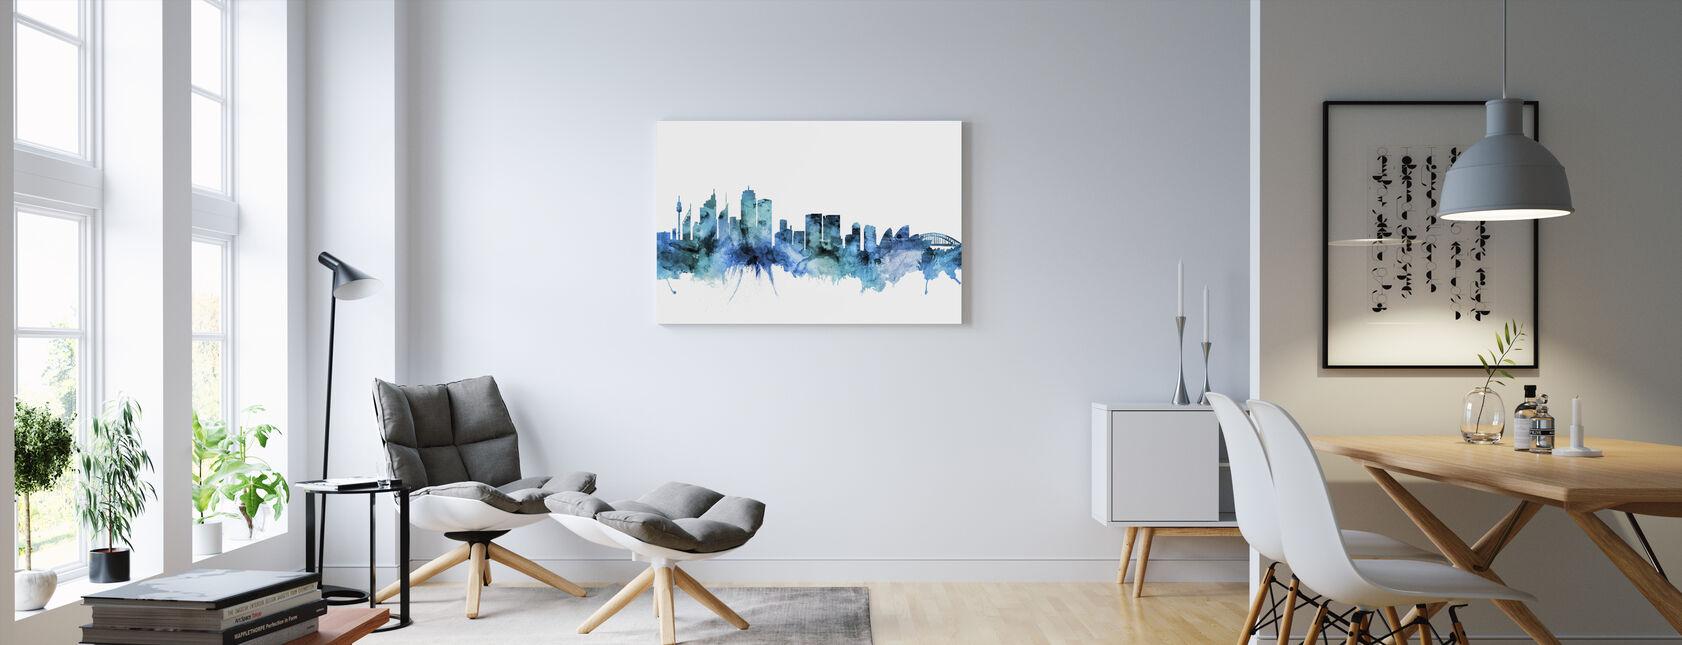 Skyline van Sydney Australië - Canvas print - Woonkamer